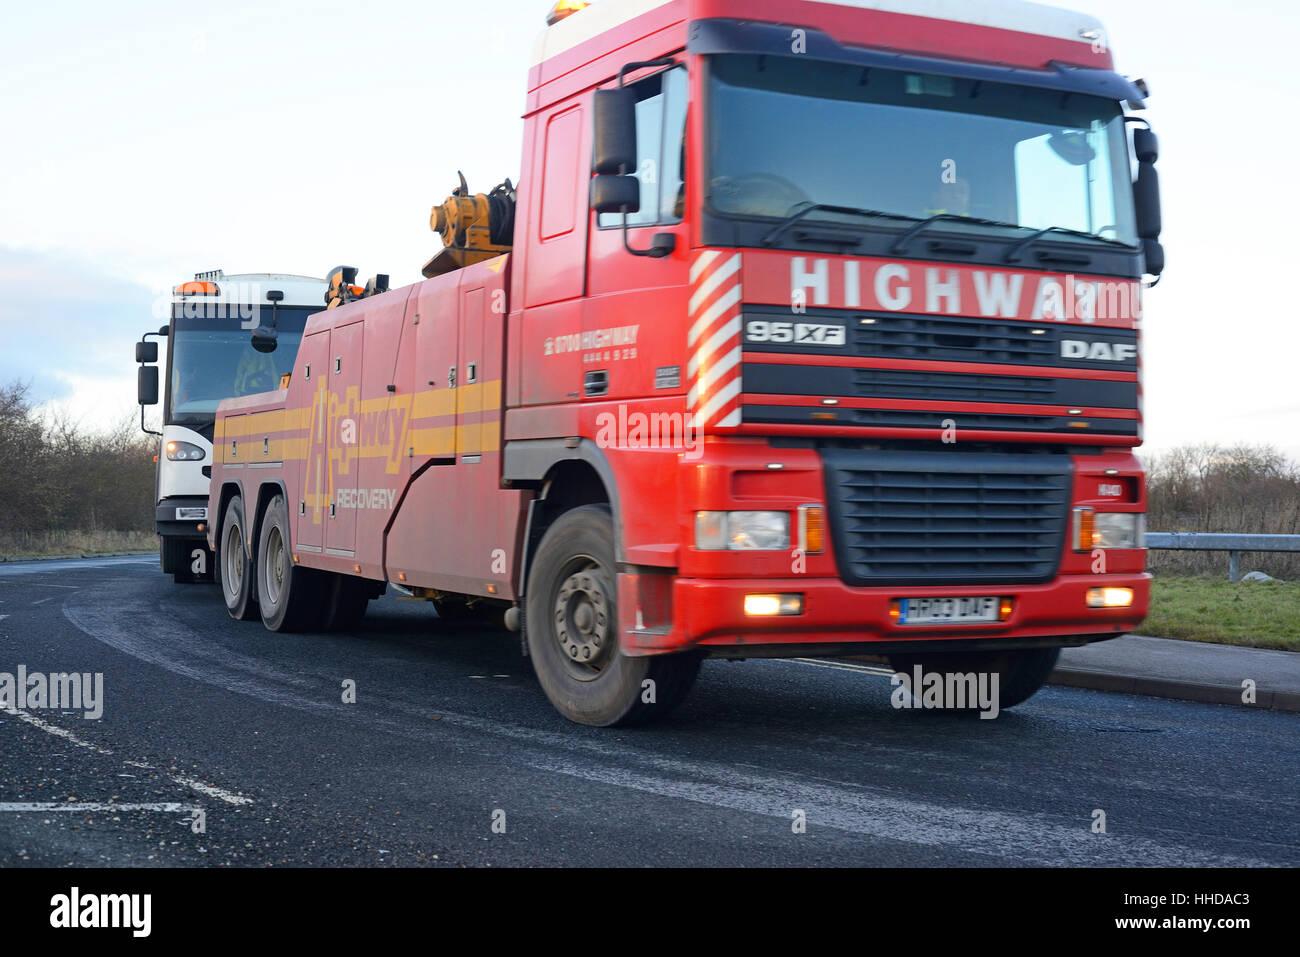 breakdown rescue lorry towing broken down vehicle york united kingdom - Stock Image